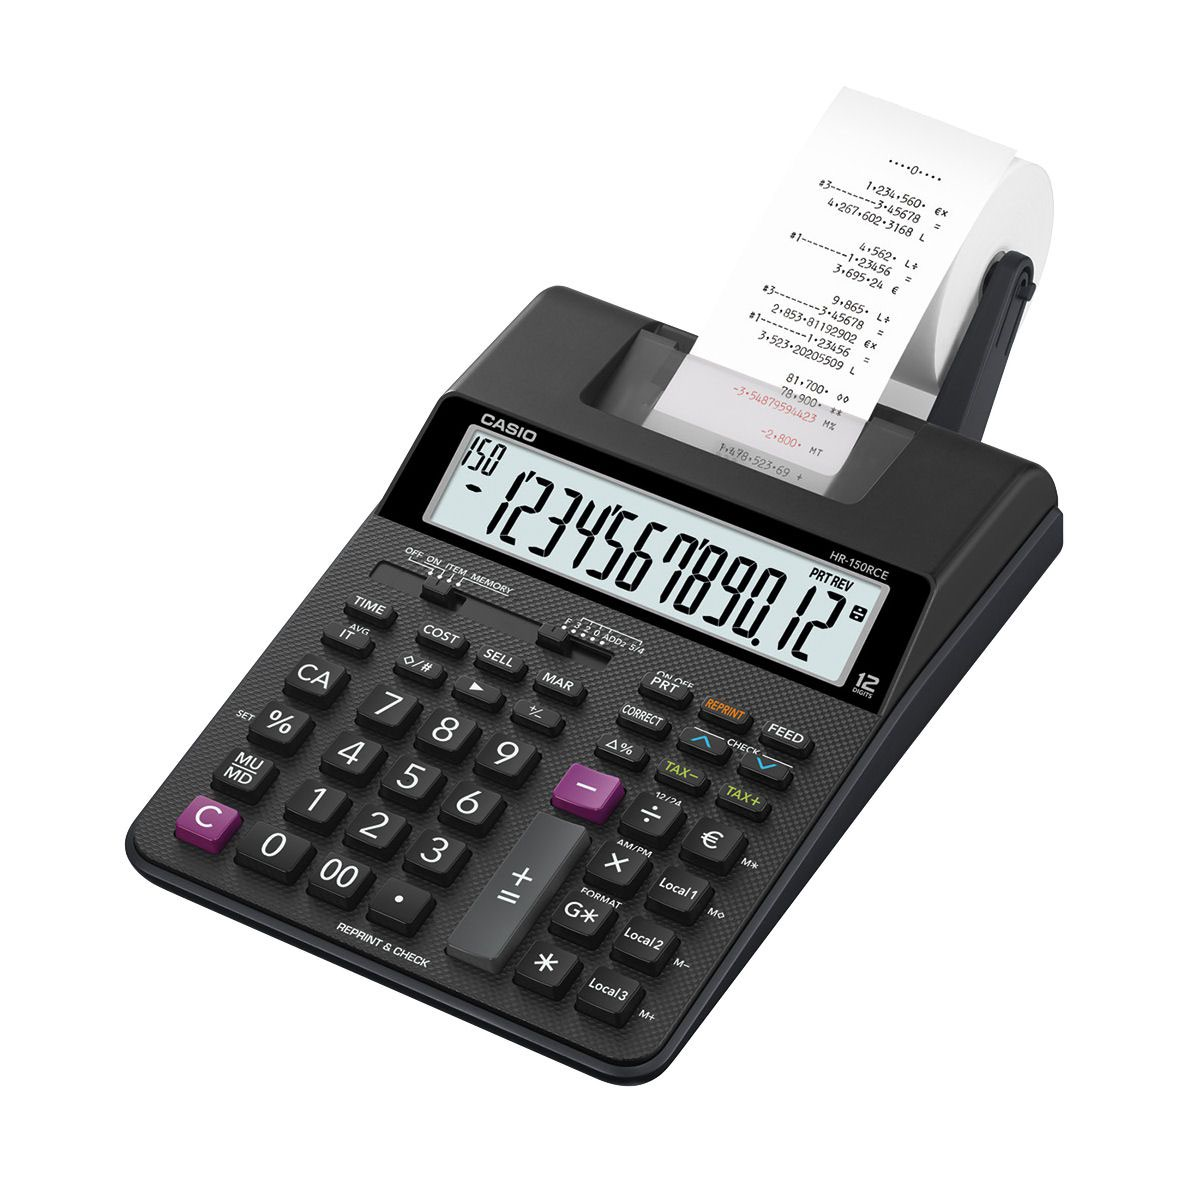 Casio Desktop Printing Calculator 12 Digit Display 2 Colour Printing 165x65x295mm Black Ref HR-150RCE